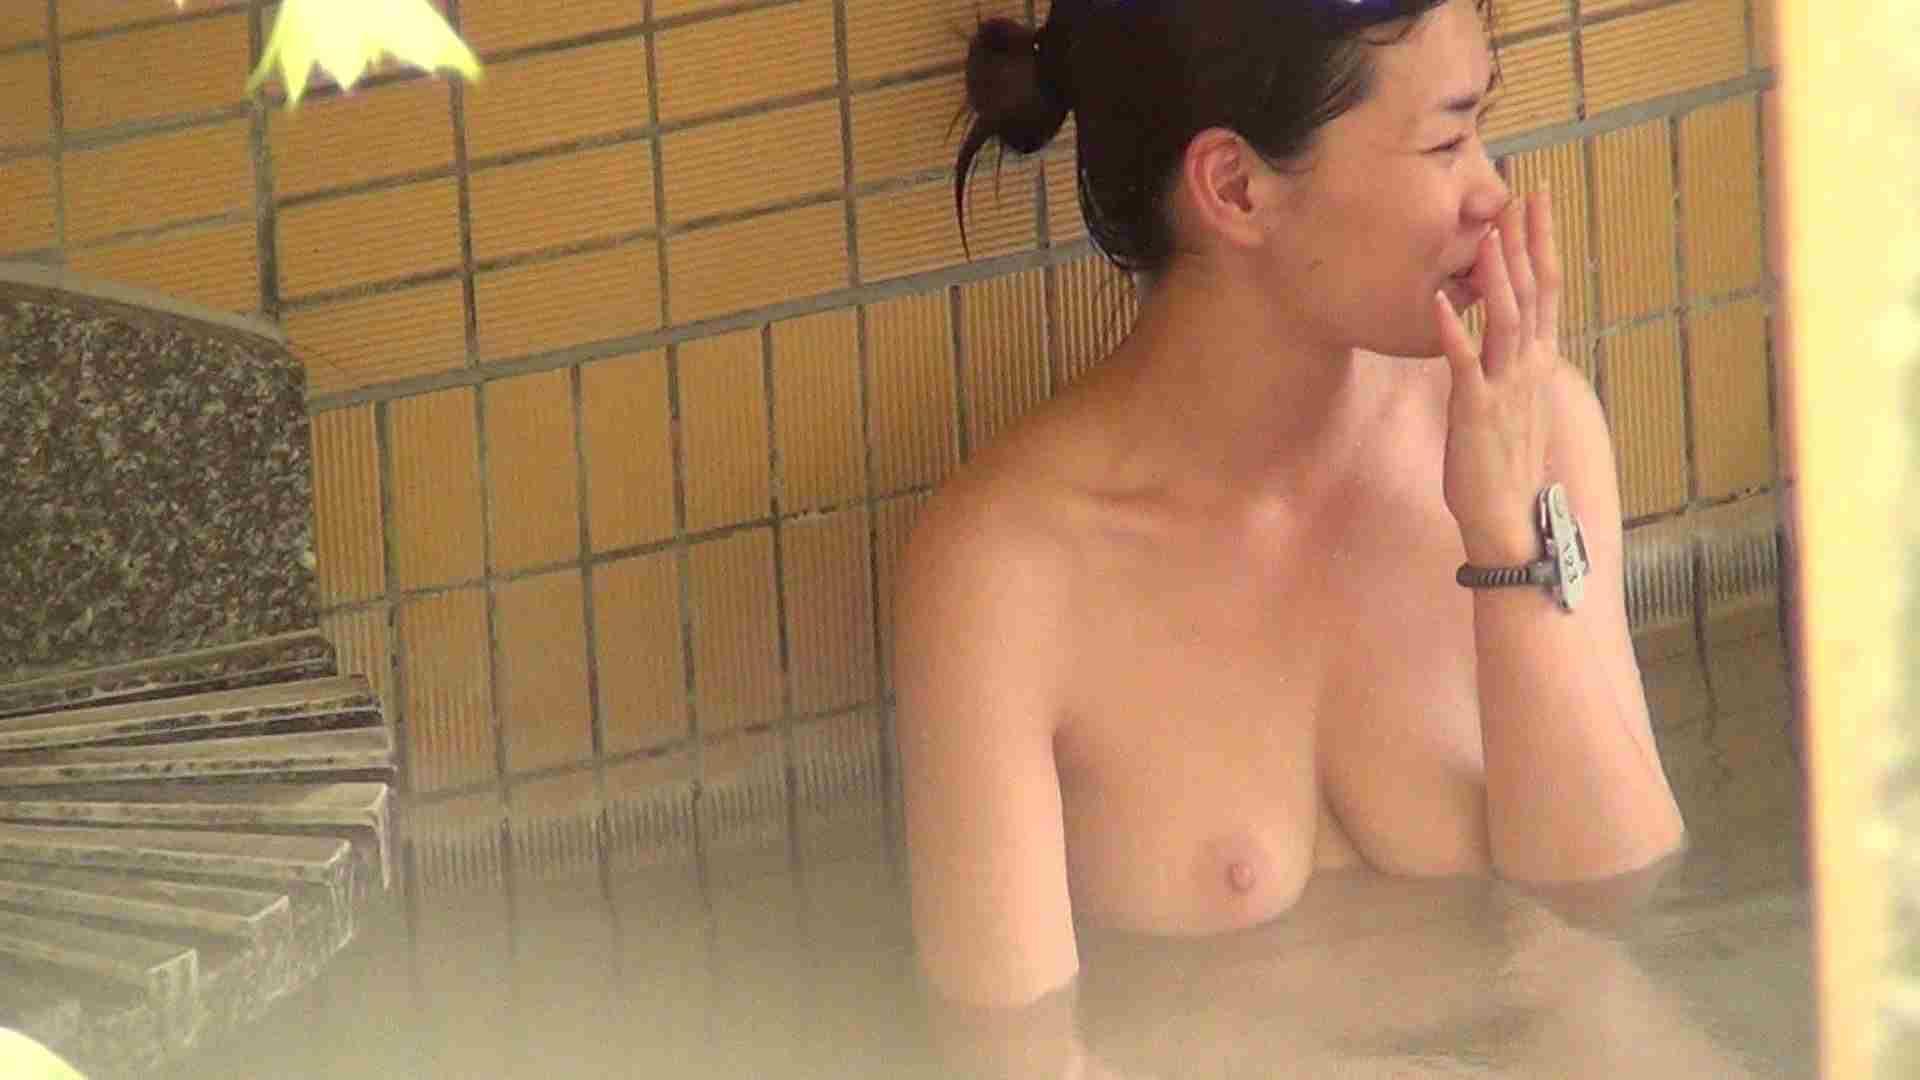 Aquaな露天風呂Vol.238 盗撮師作品  87pic 84